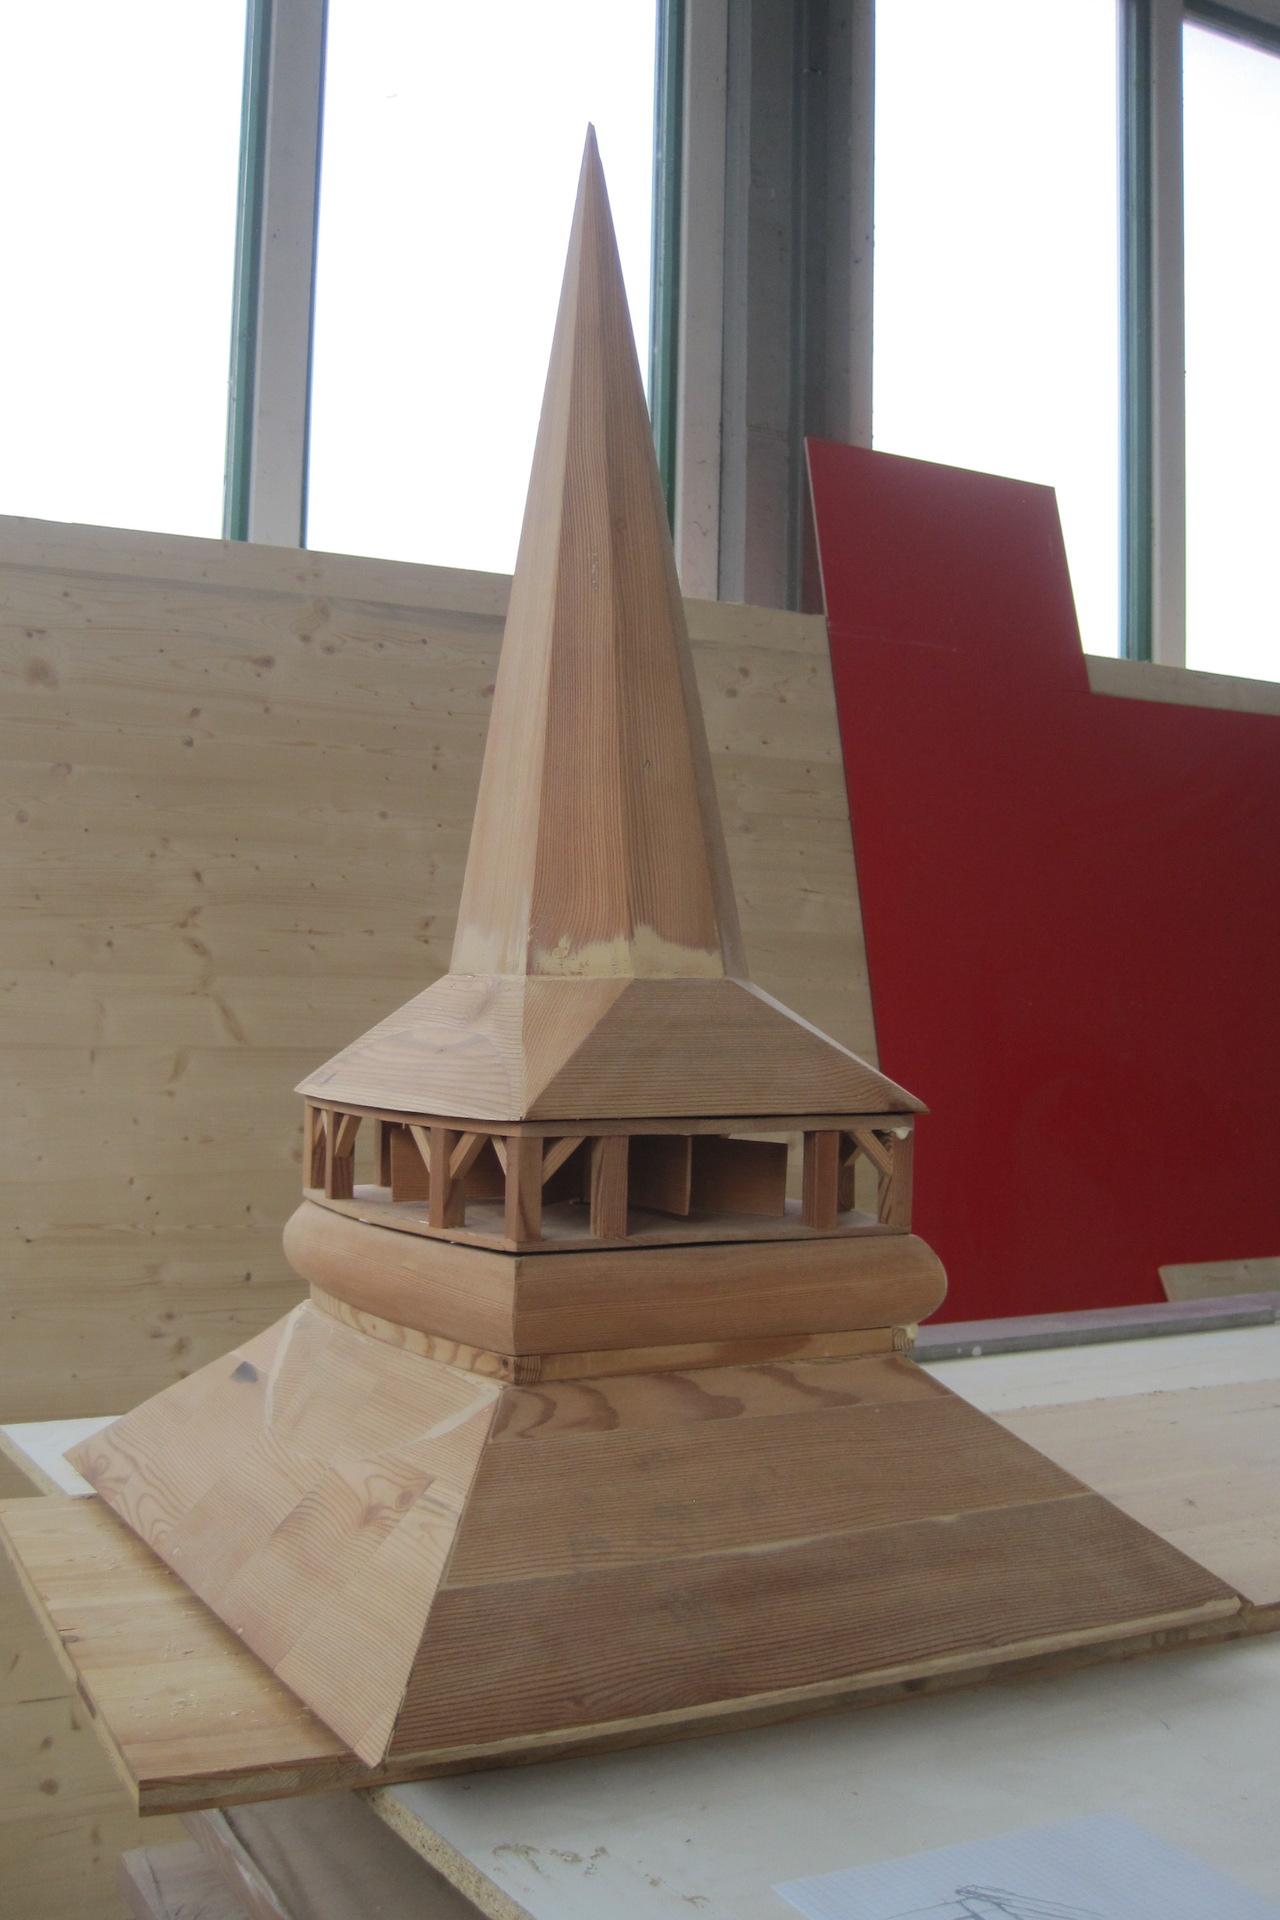 Modell der Konstruktion